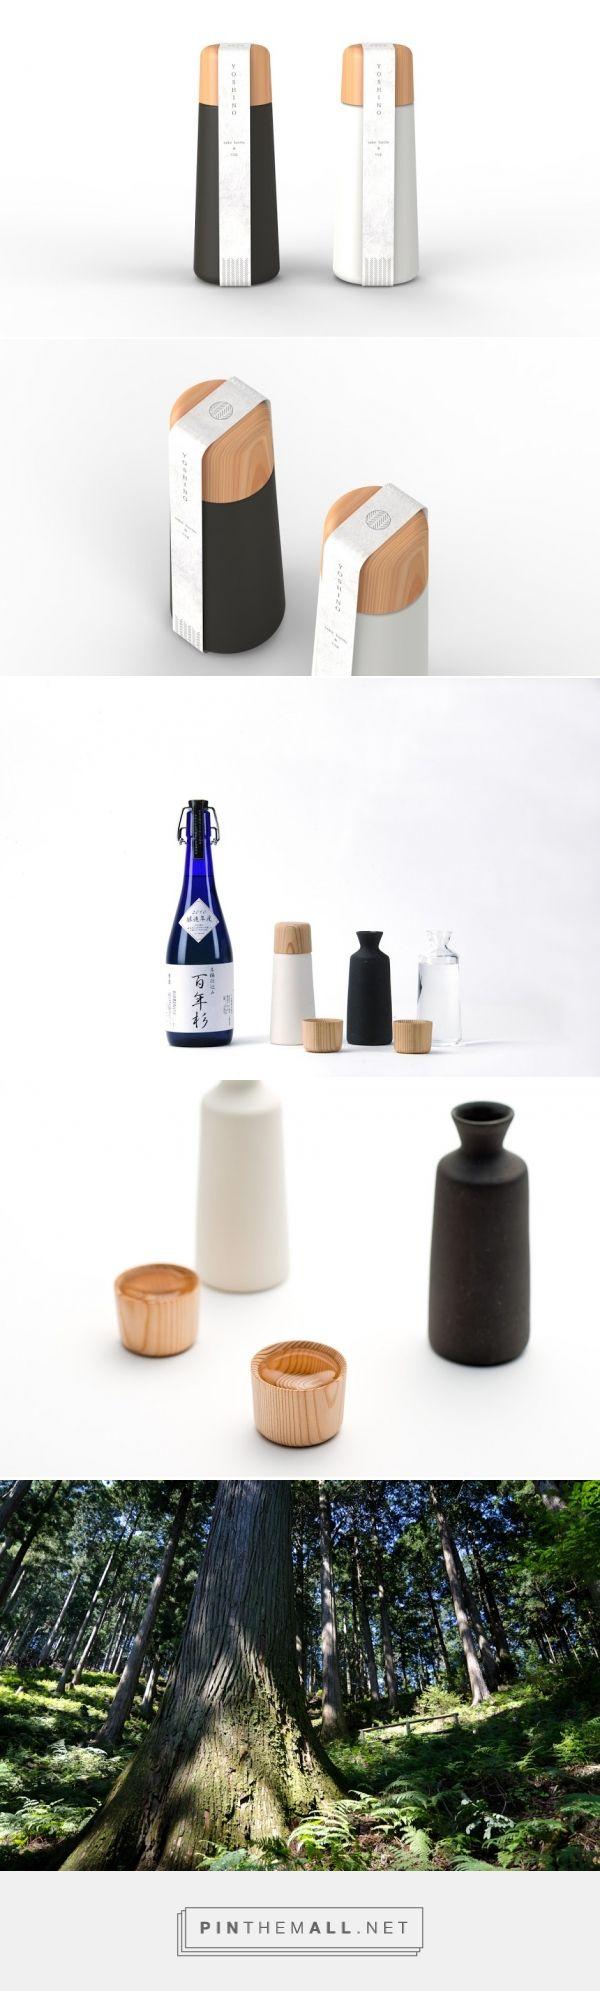 Yoshino #Sake #Cup And #Bottle designed by Doogdesign (#Japan) - http://www.packagingoftheworld.com/2016/02/yoshino-sake-cup-and-bottle.html